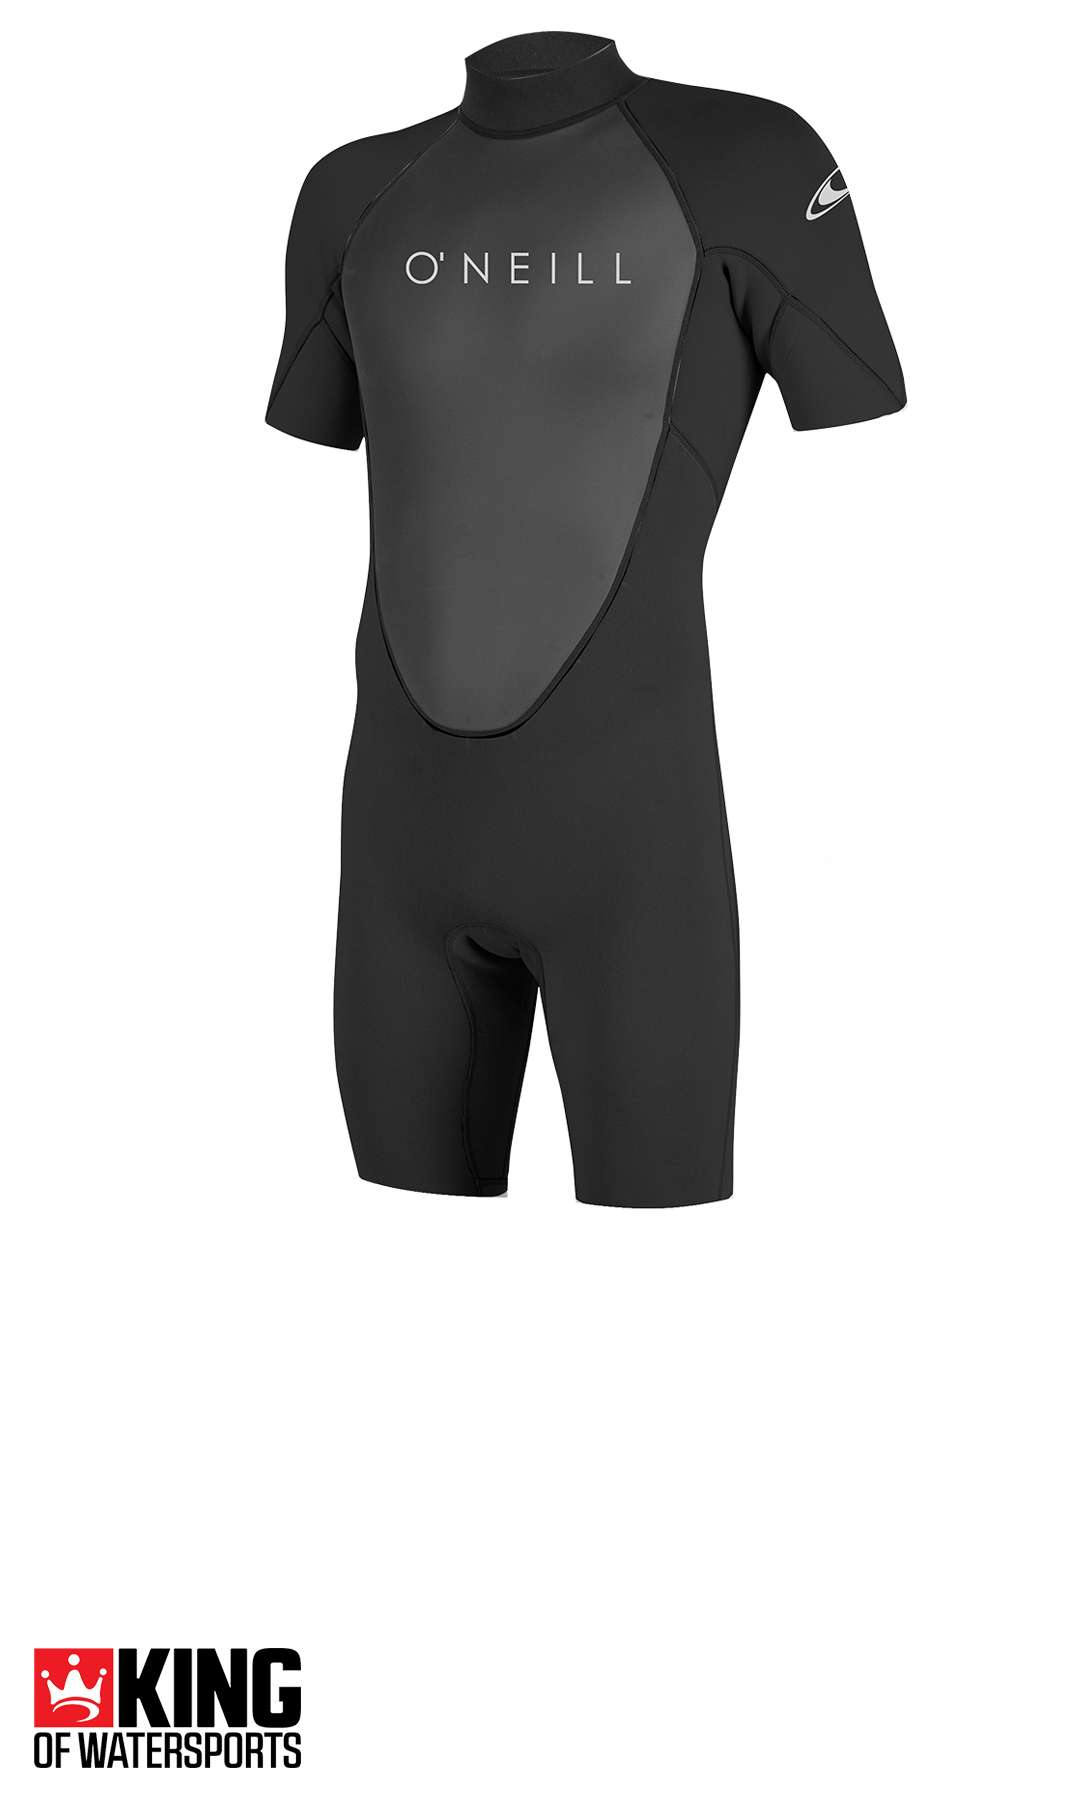 002106b560 O Neill Reactor II 2mm Shorty Wetsuit 2018